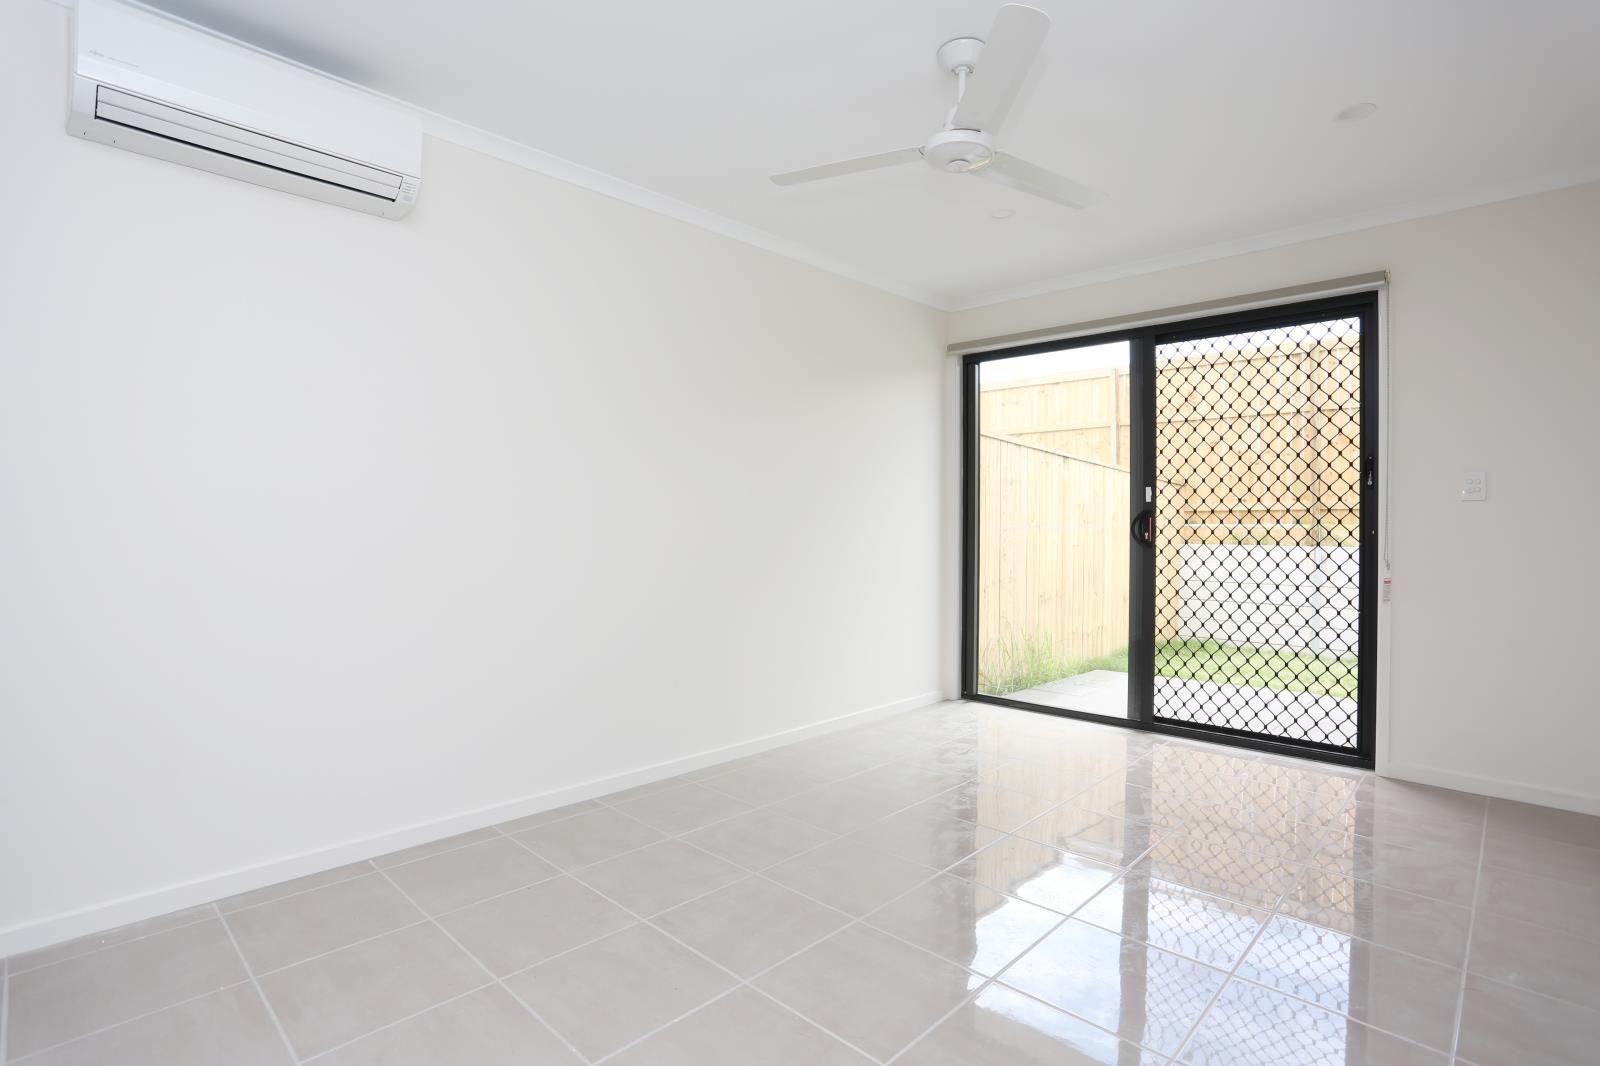 2/19 College Street, Bahrs Scrub QLD 4207, Image 1